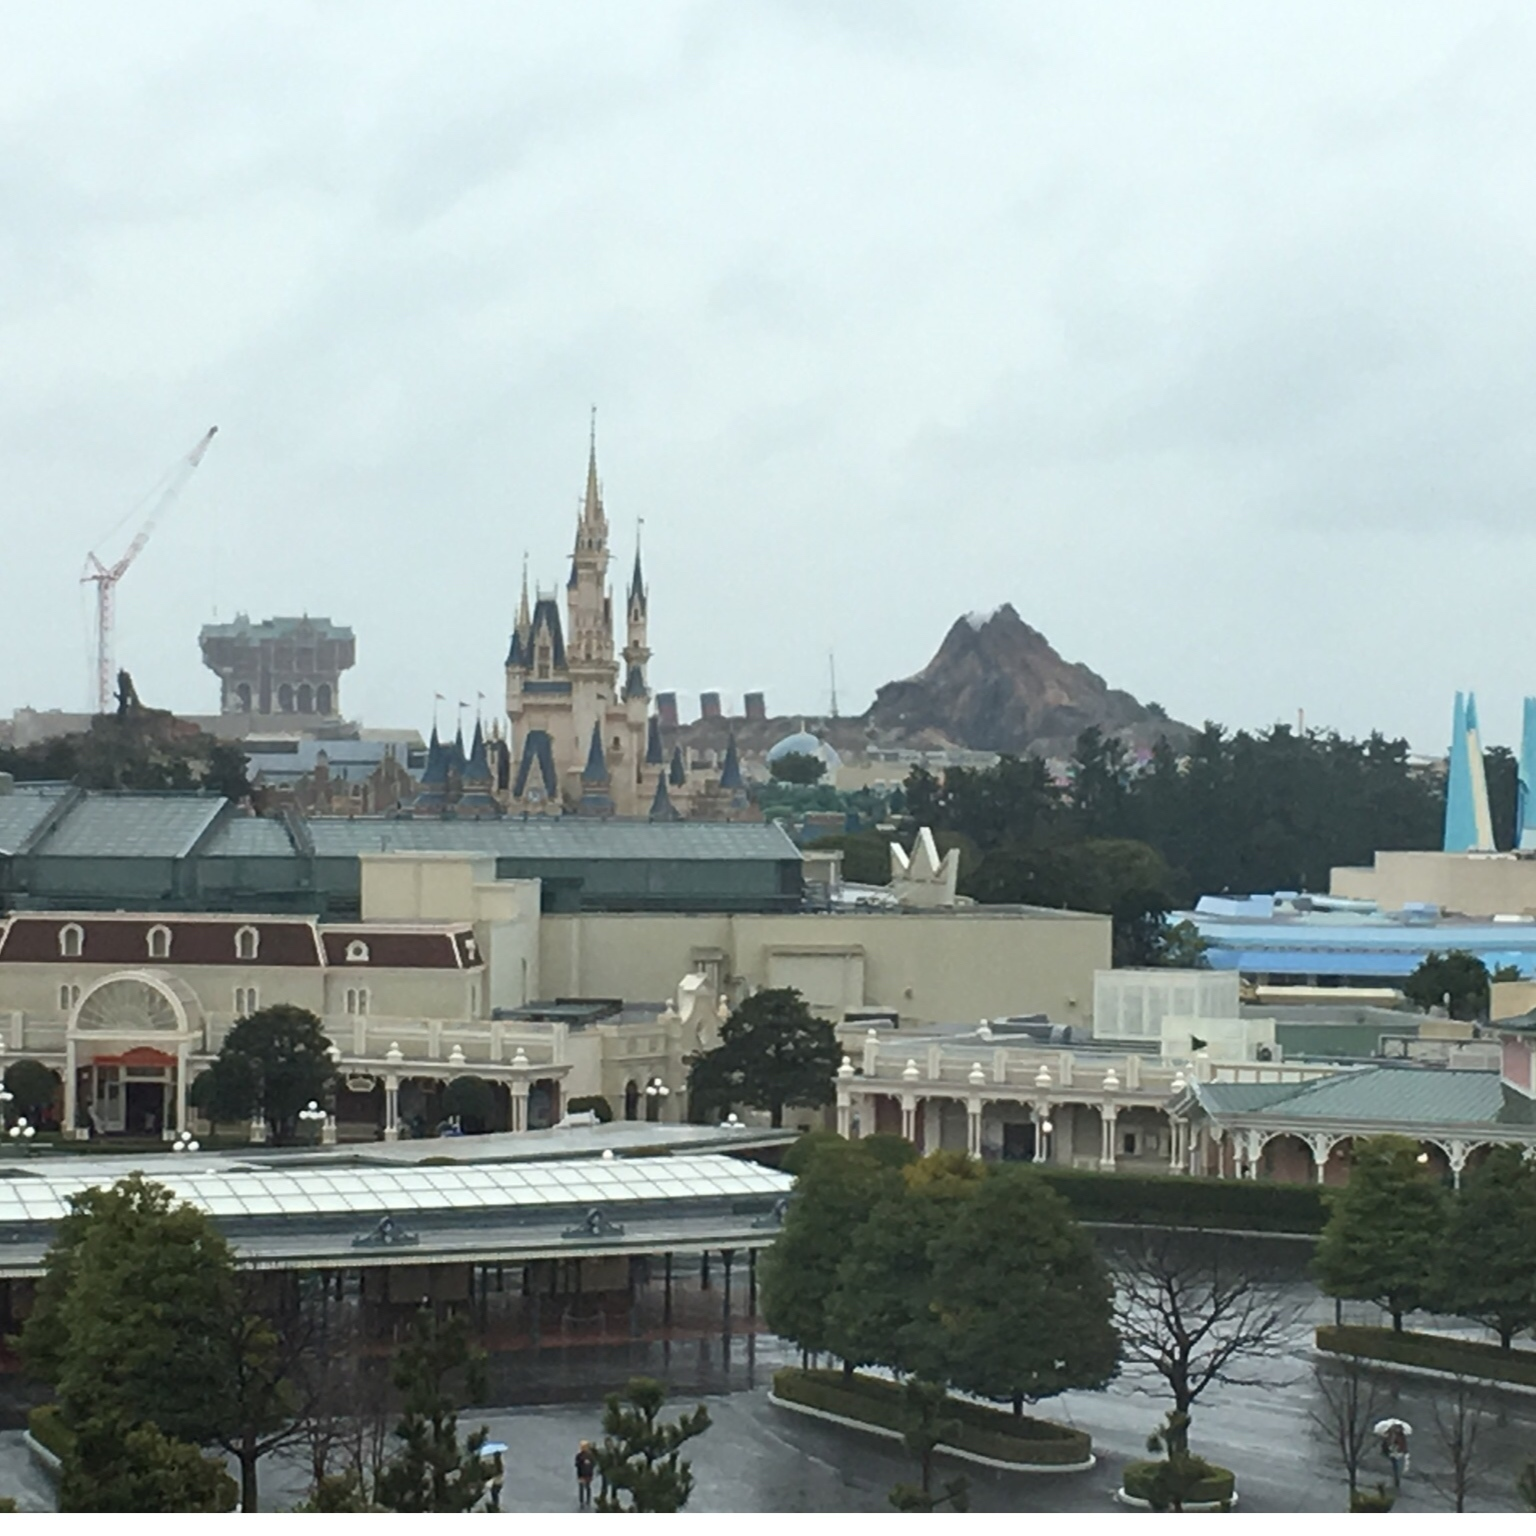 Disneyland Hotel _1_4